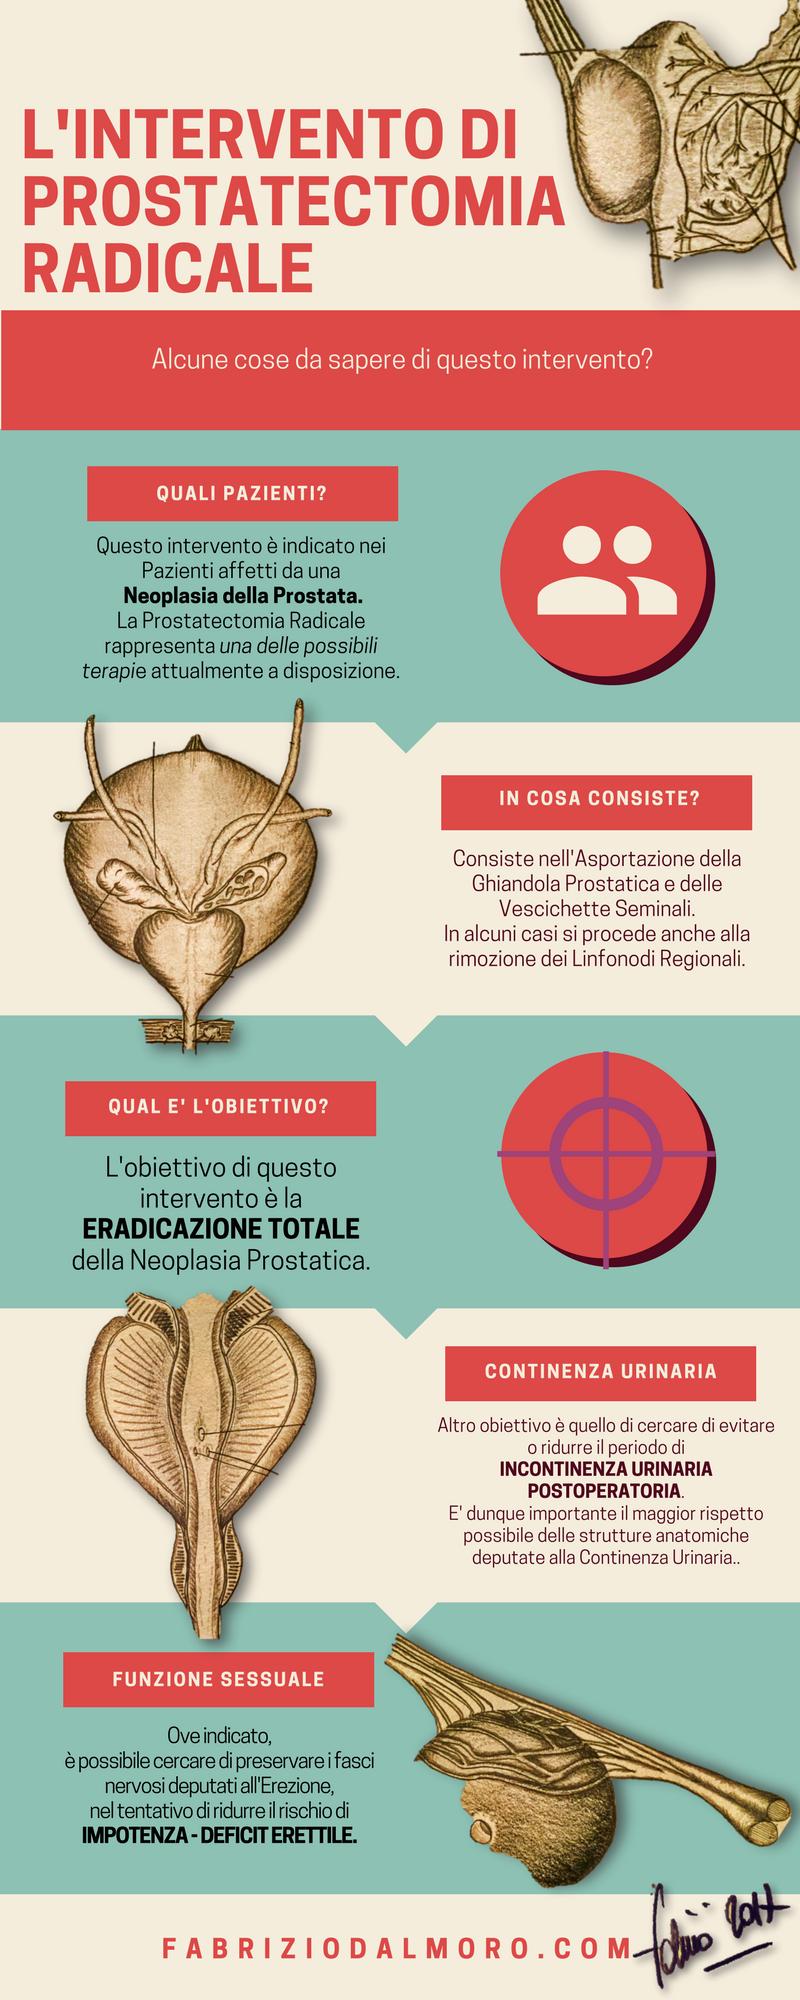 anatomia patologica tumore prostata